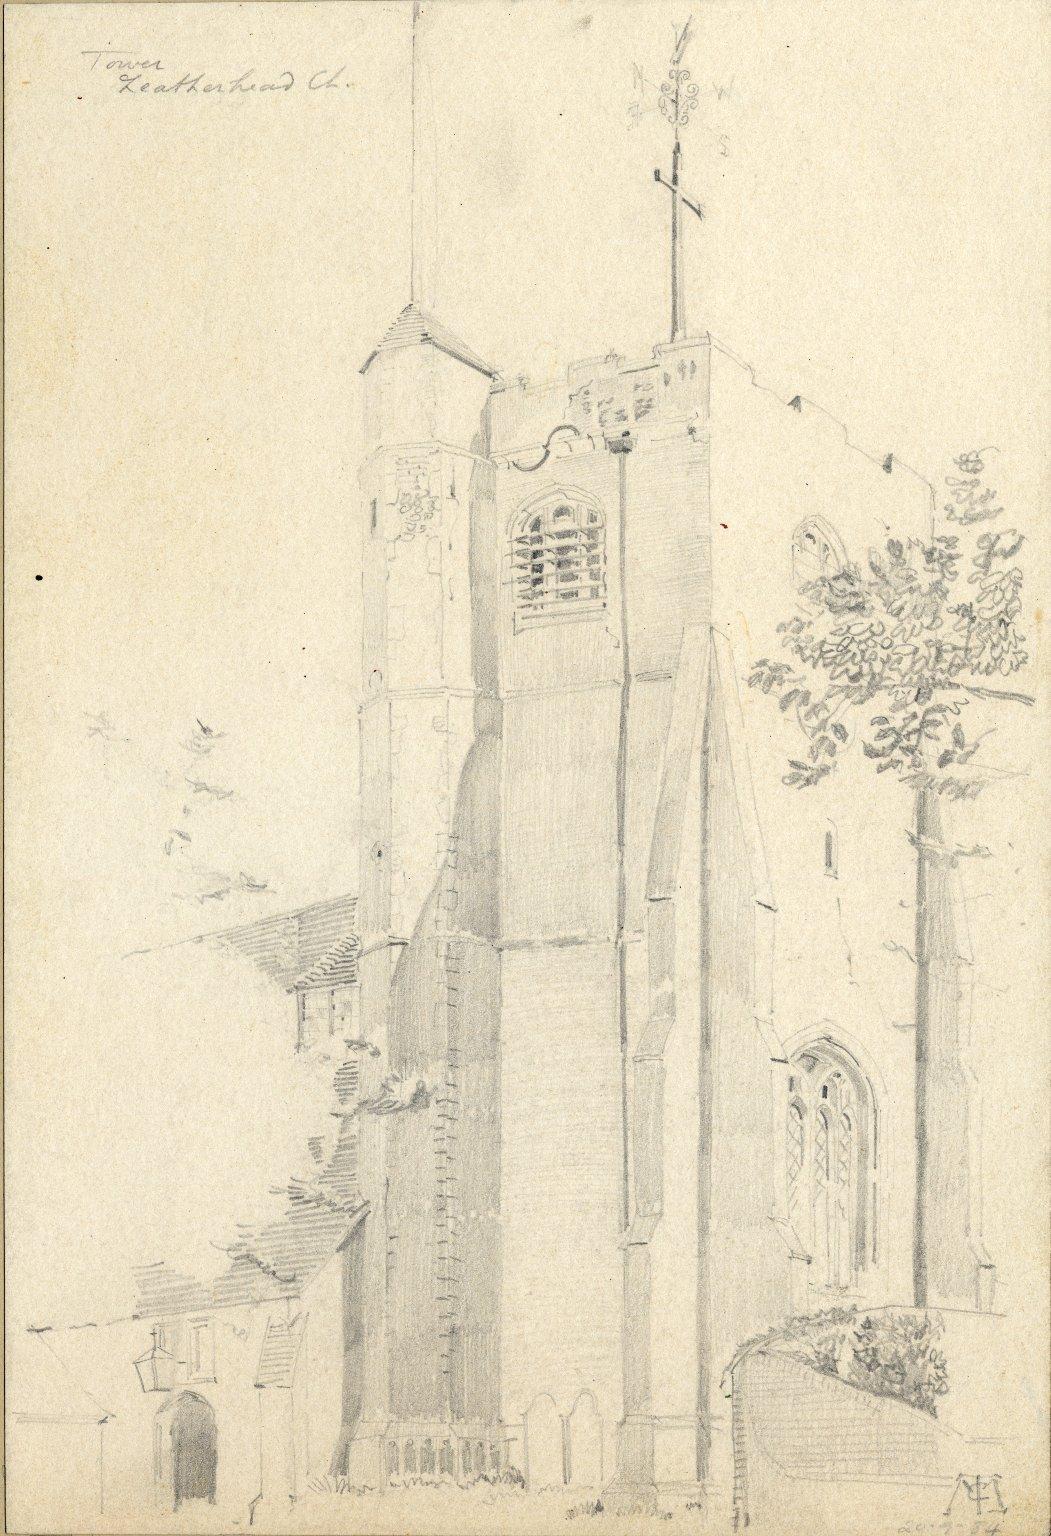 Tower of Leatherhead Church